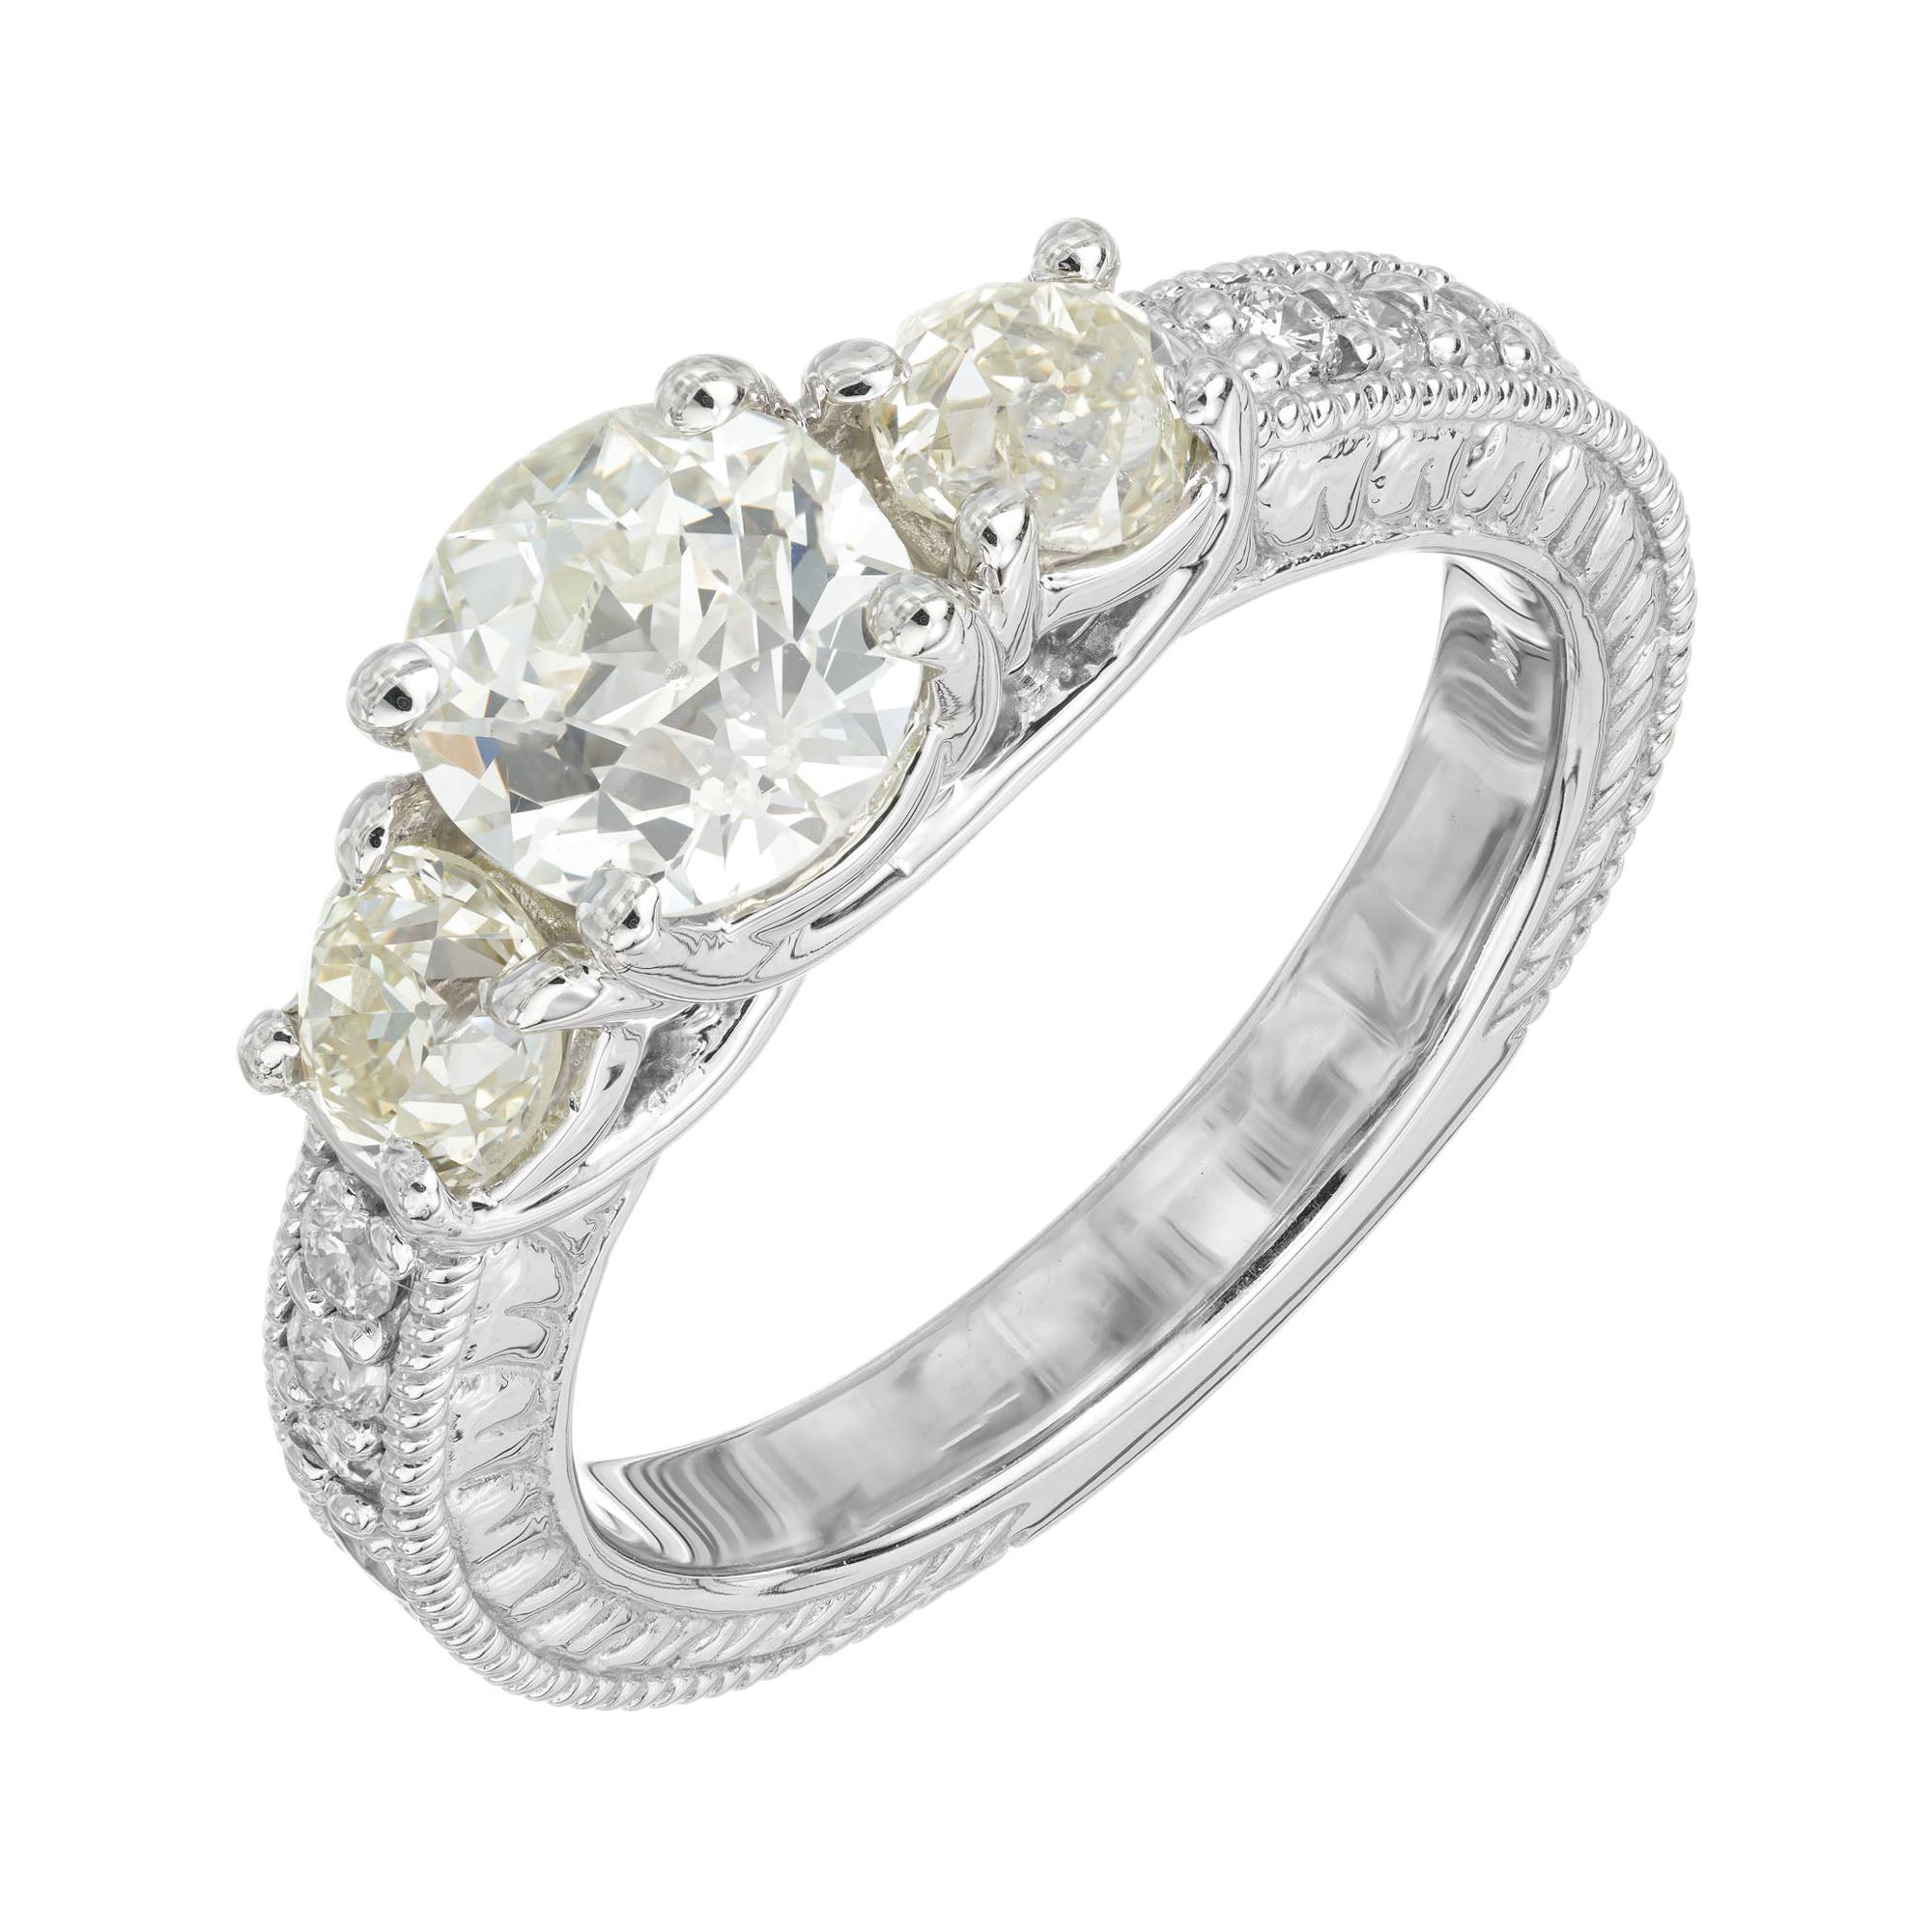 1.22 Carat Old European Cut Three-Stone Diamond White Gold Engagement Ring